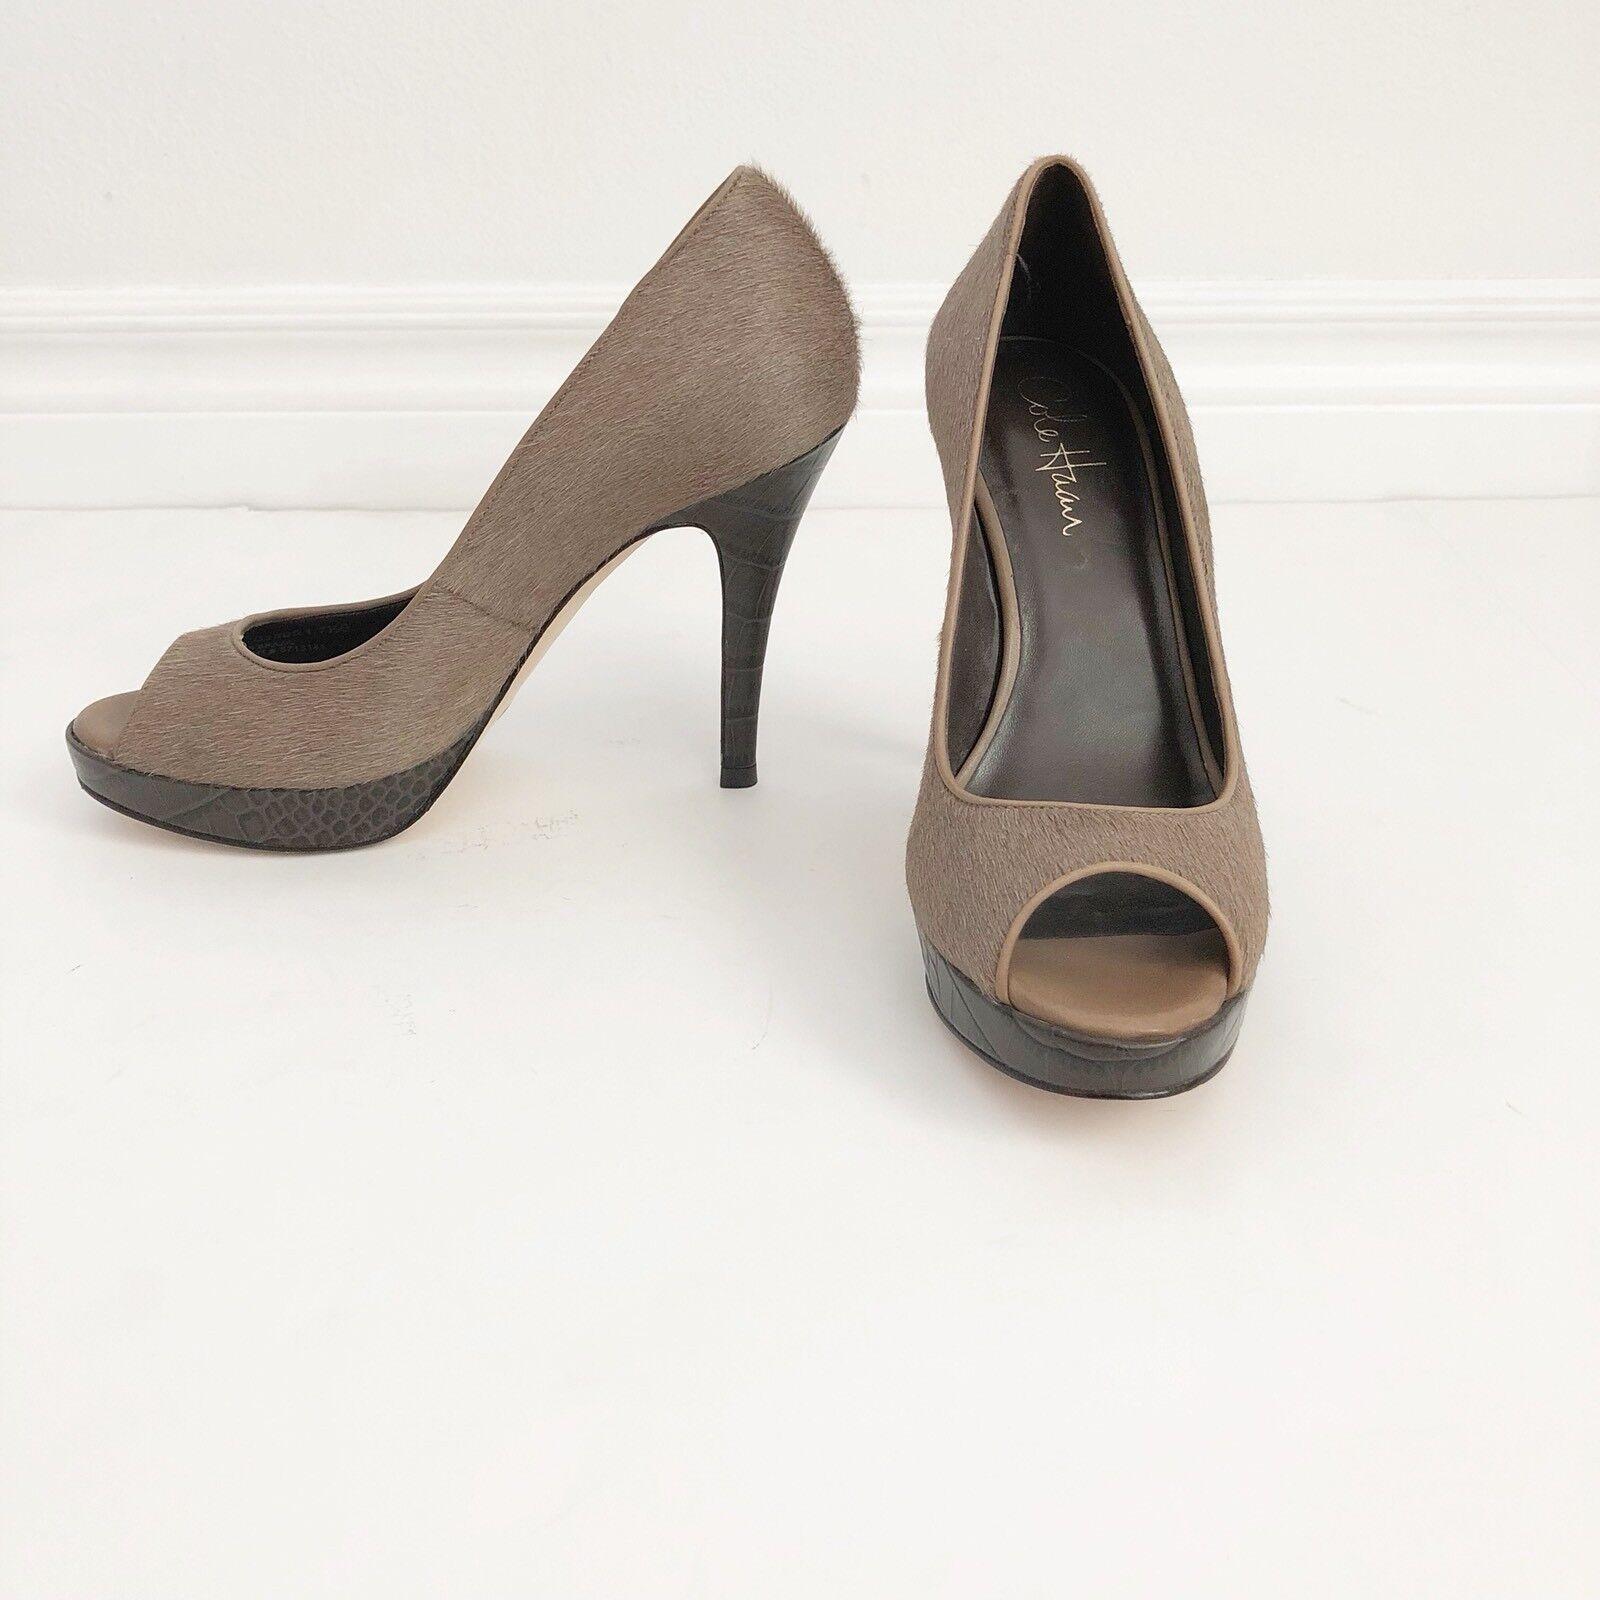 NEW Cole Haan Size 7.5 Peep Toe Calf Hair Pump Heel   (msrp  327.00)